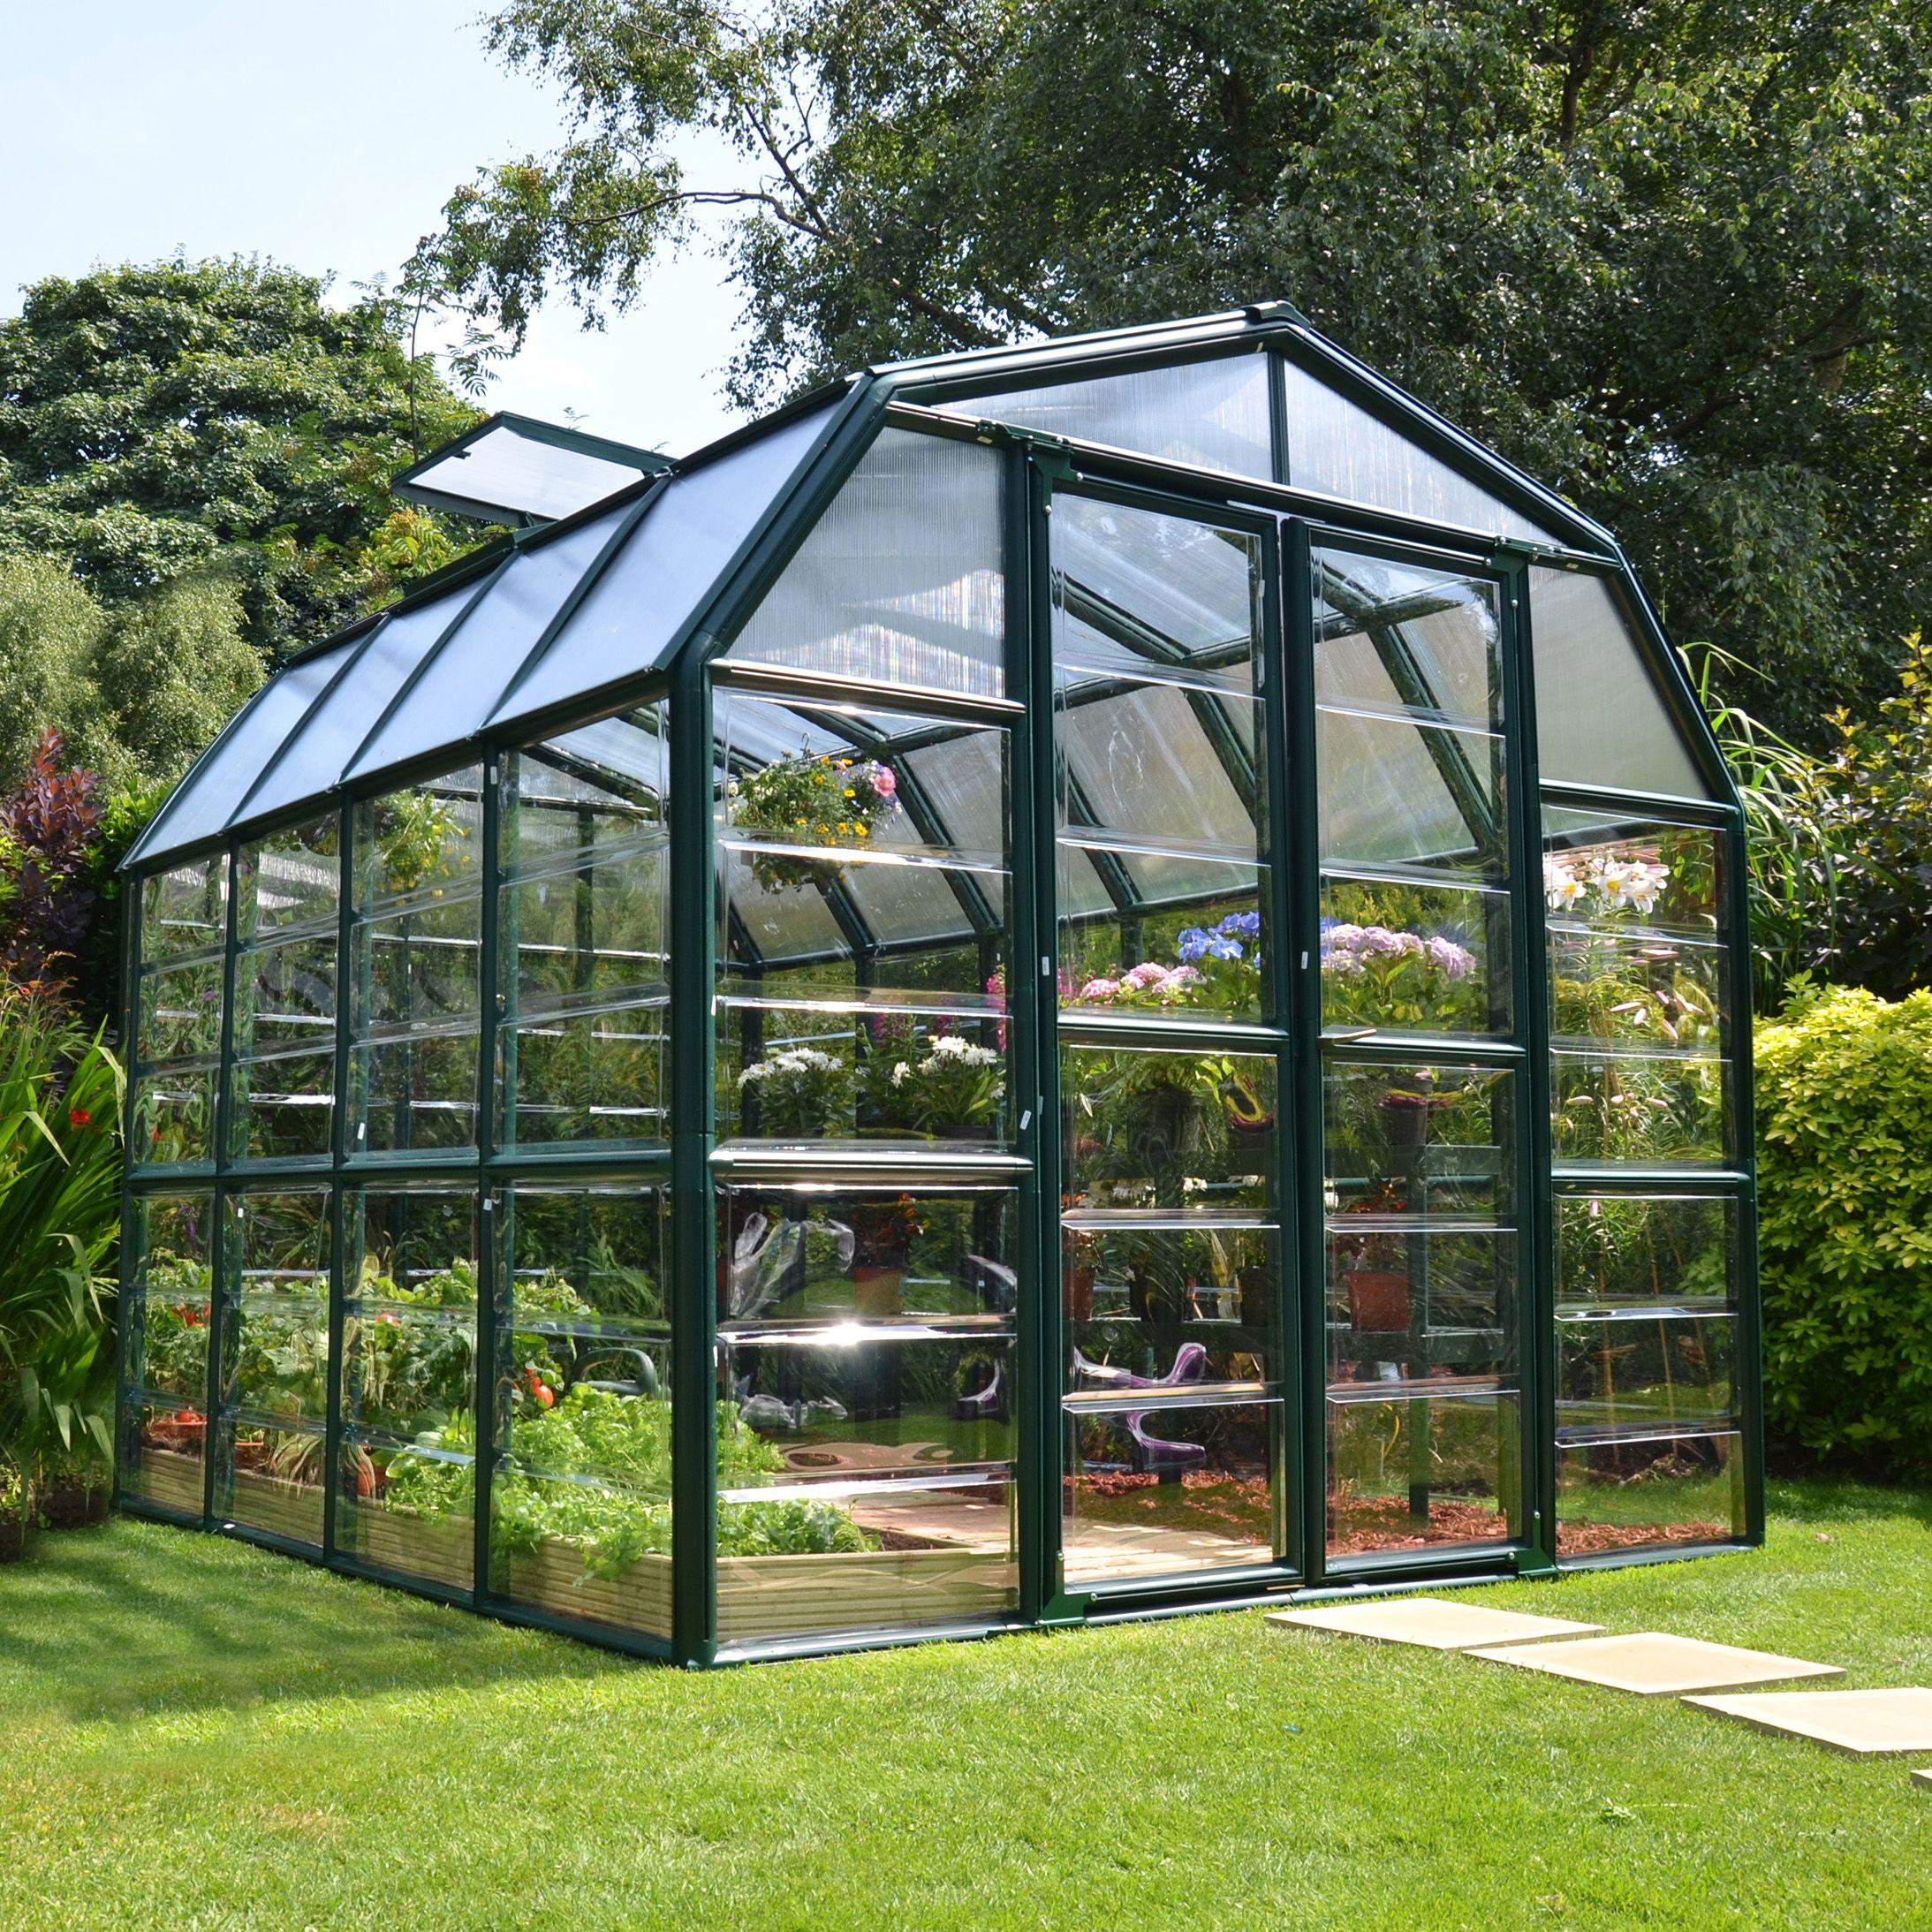 Window Greenhouse Insert Kitchen Window Greenhouses: Rion Grand Gardner 8x8 Acrylic Glass Greenhouse